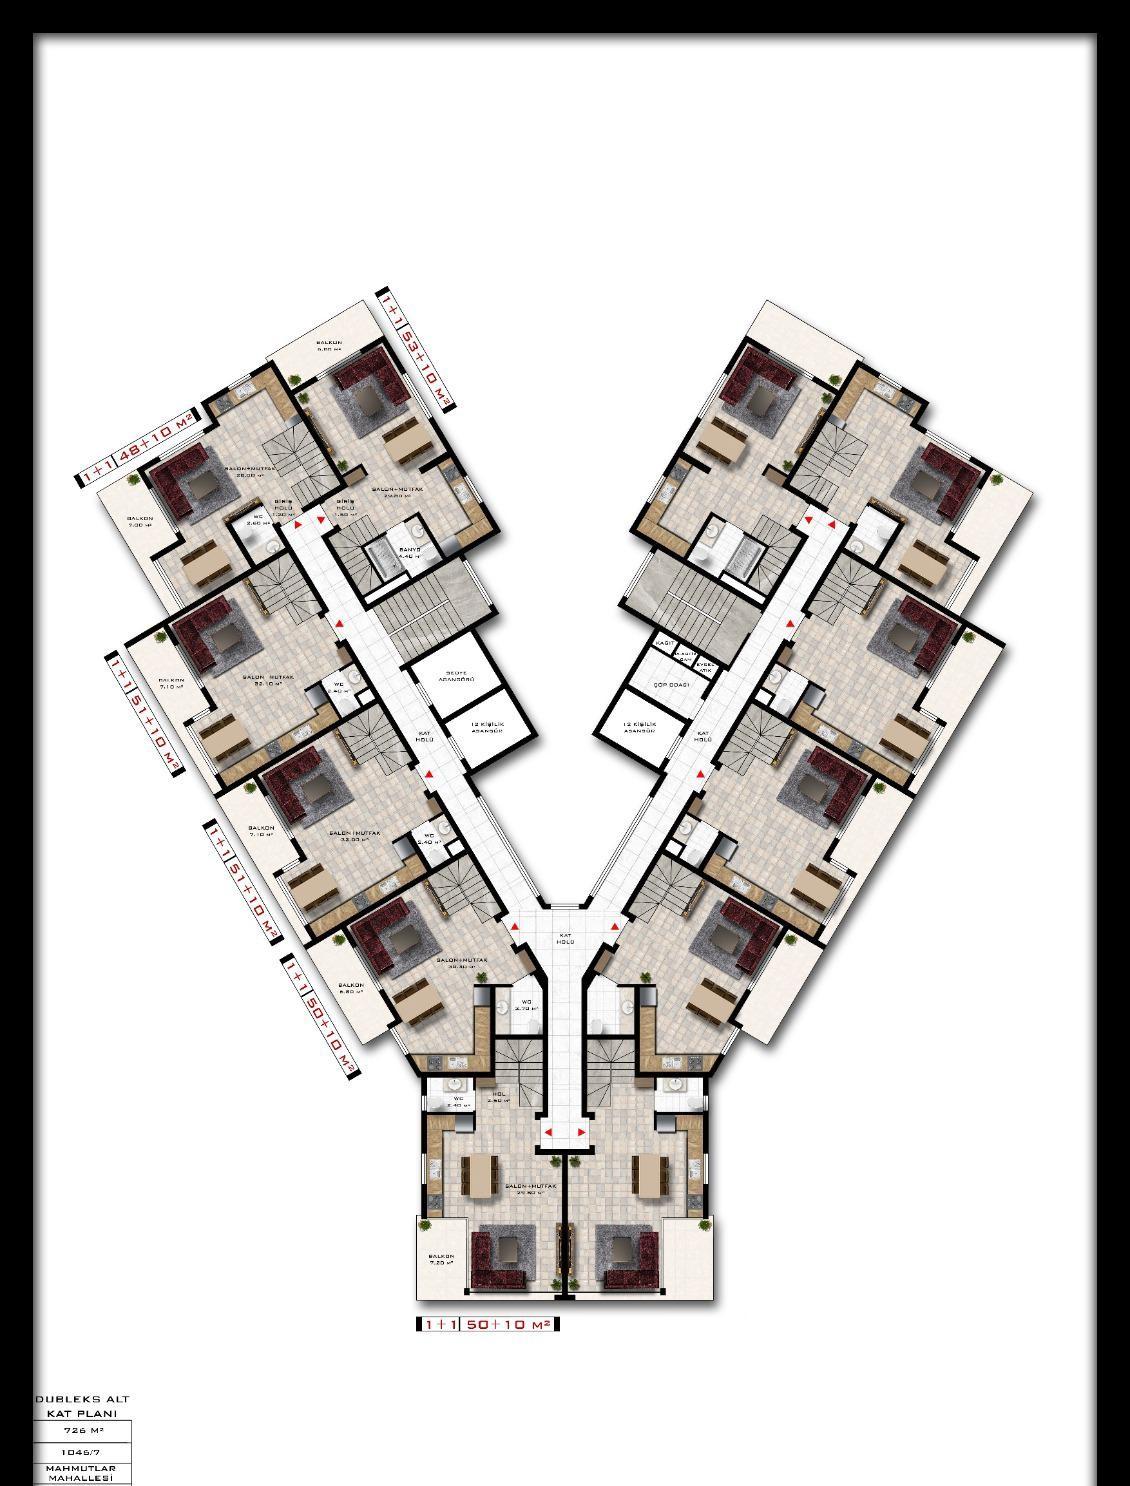 Квартиры и пентхаусы в комплексе с богатой инфраструктурой район Махмутлар - Фото 17